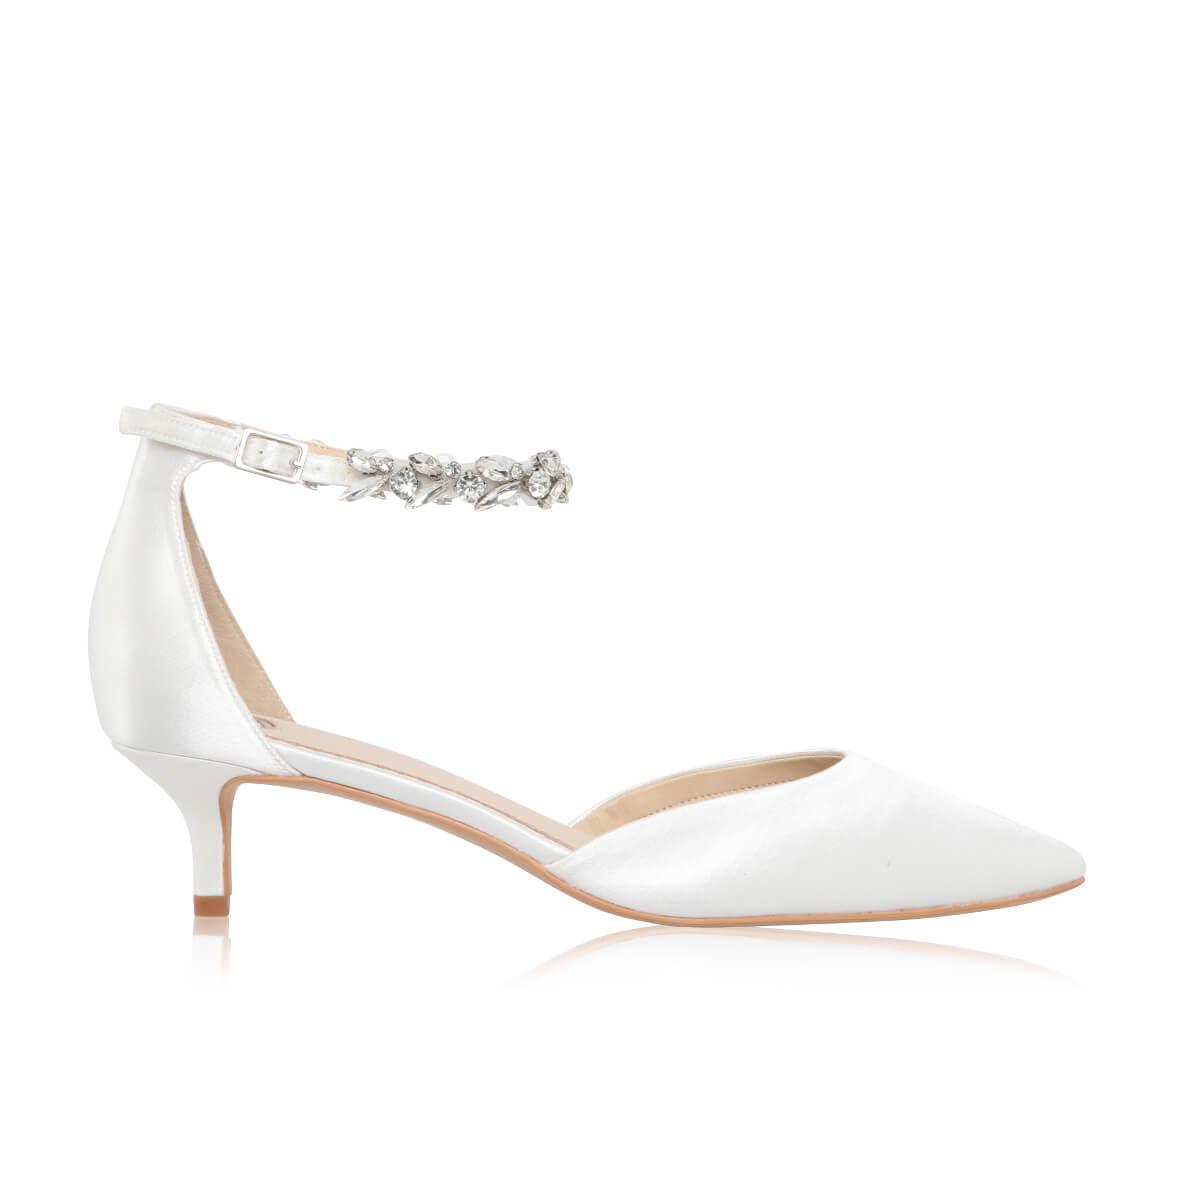 Eliza Low Heel Wedding Shoes The